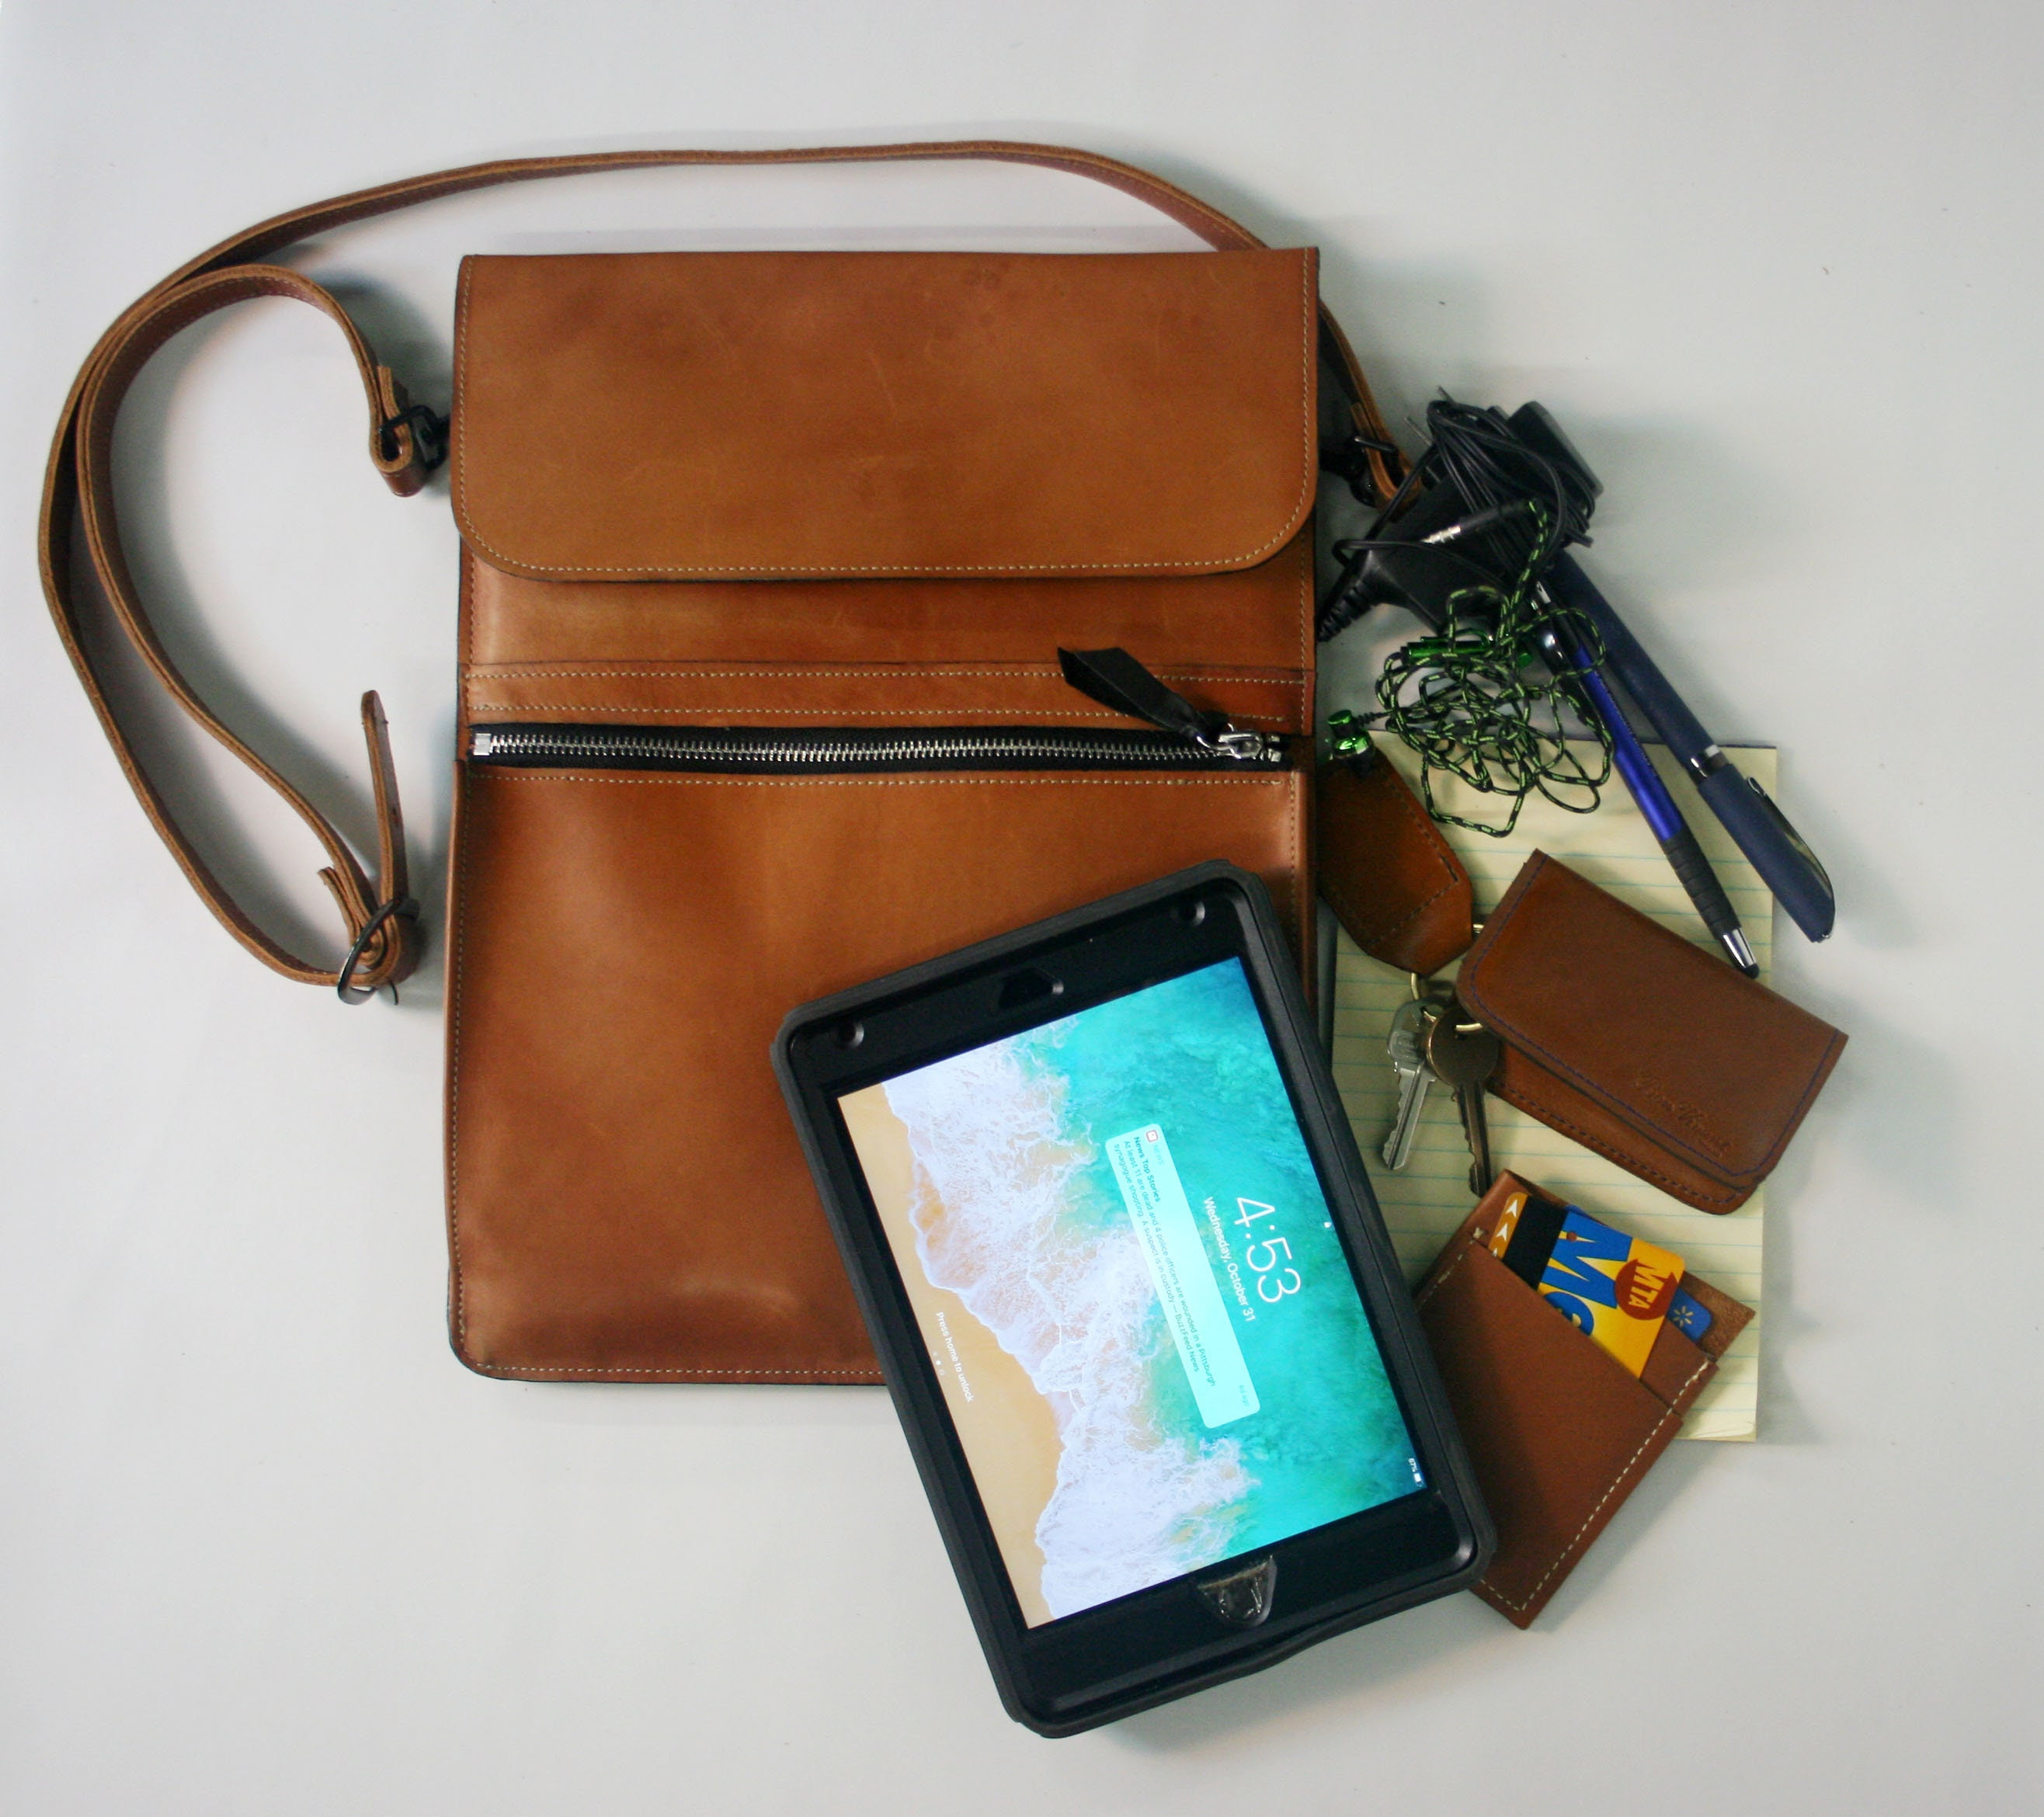 VEGA tablet/I-Pad hip/cross body/messenger bag in Horween leather